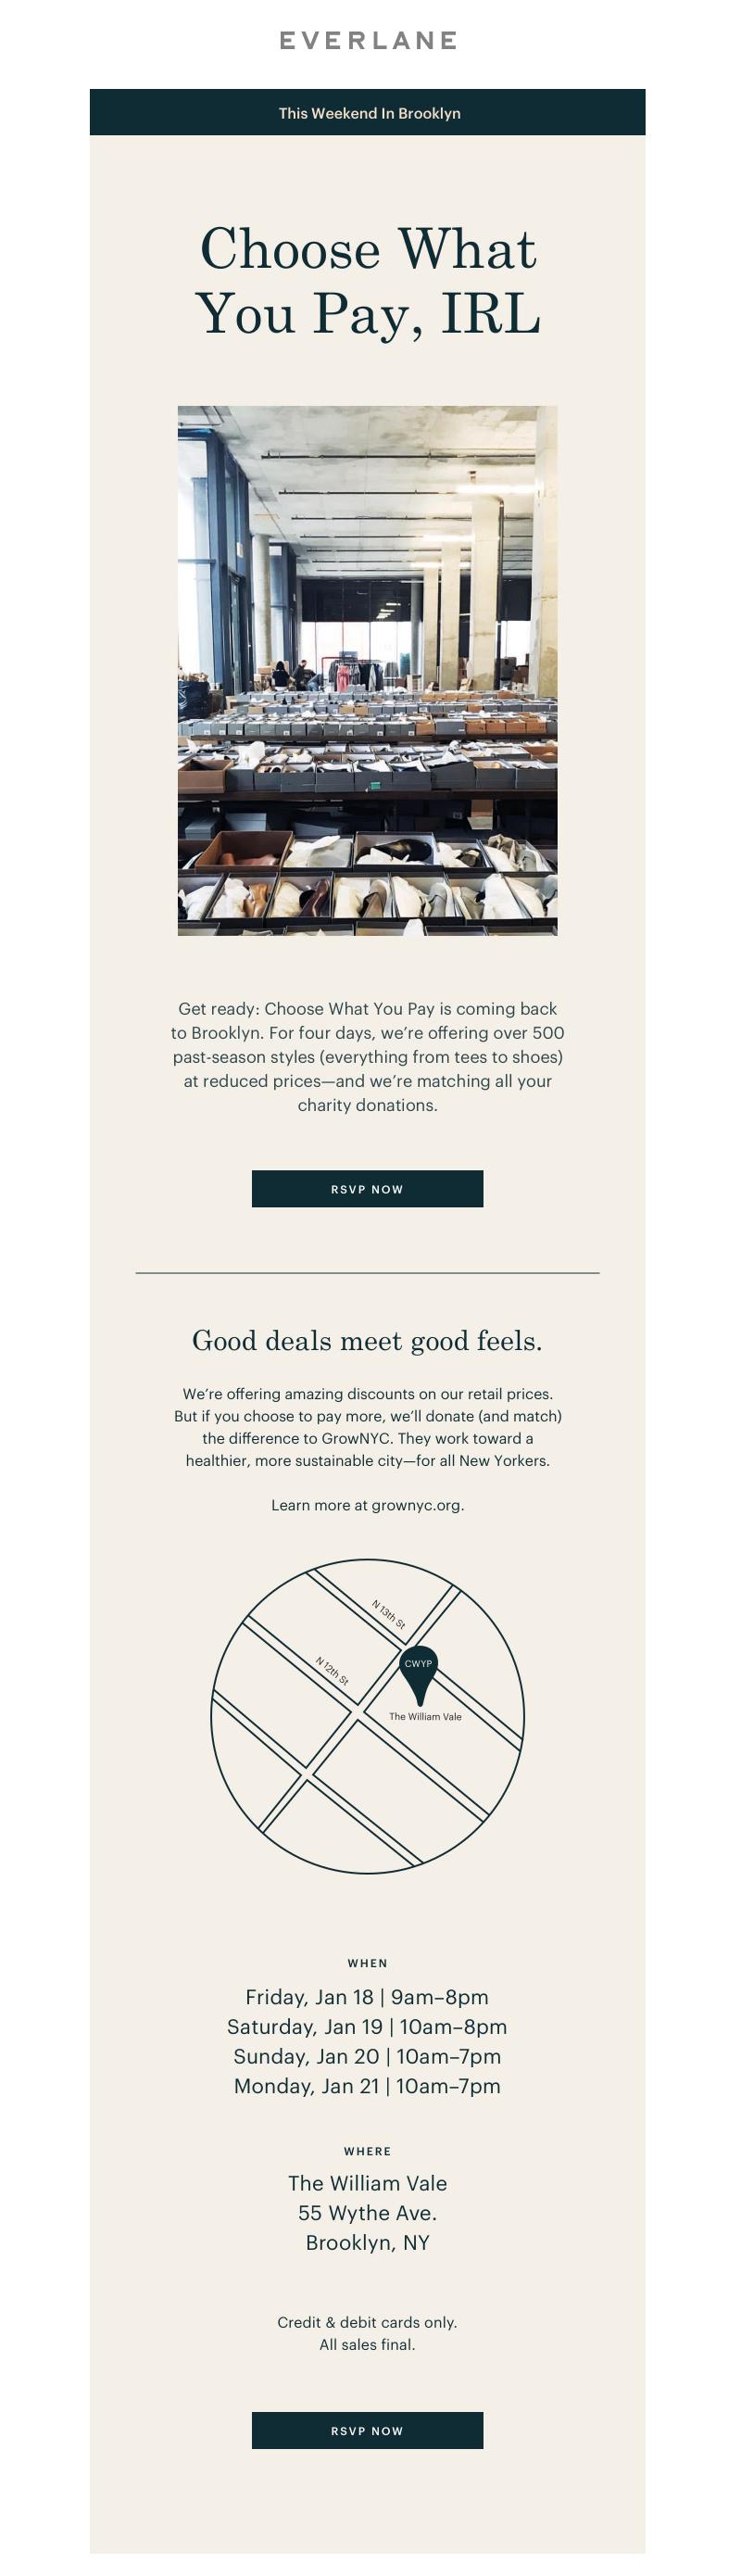 minimalist graphic design from everlane